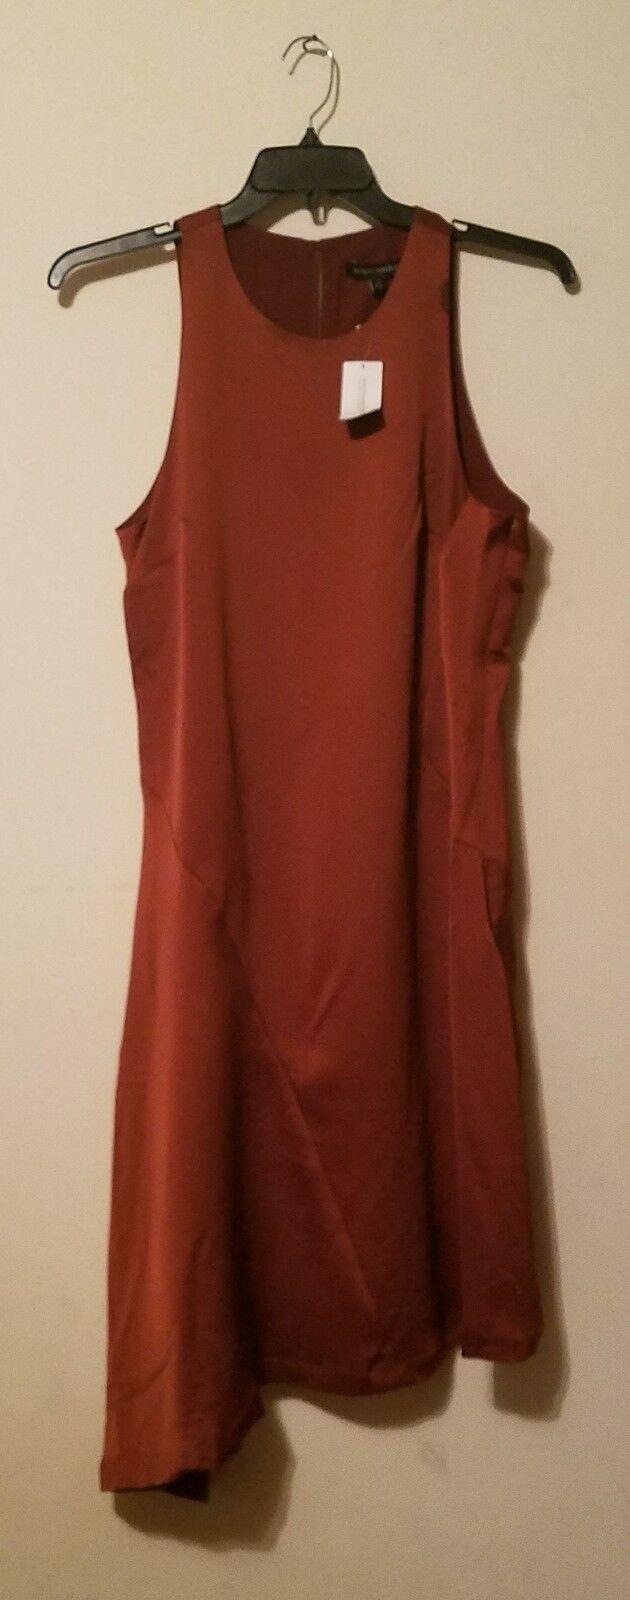 NWT Banana Republic Asymmetrical Bias Cut  Dress Mesquite Wood Bronze Brn sz 14